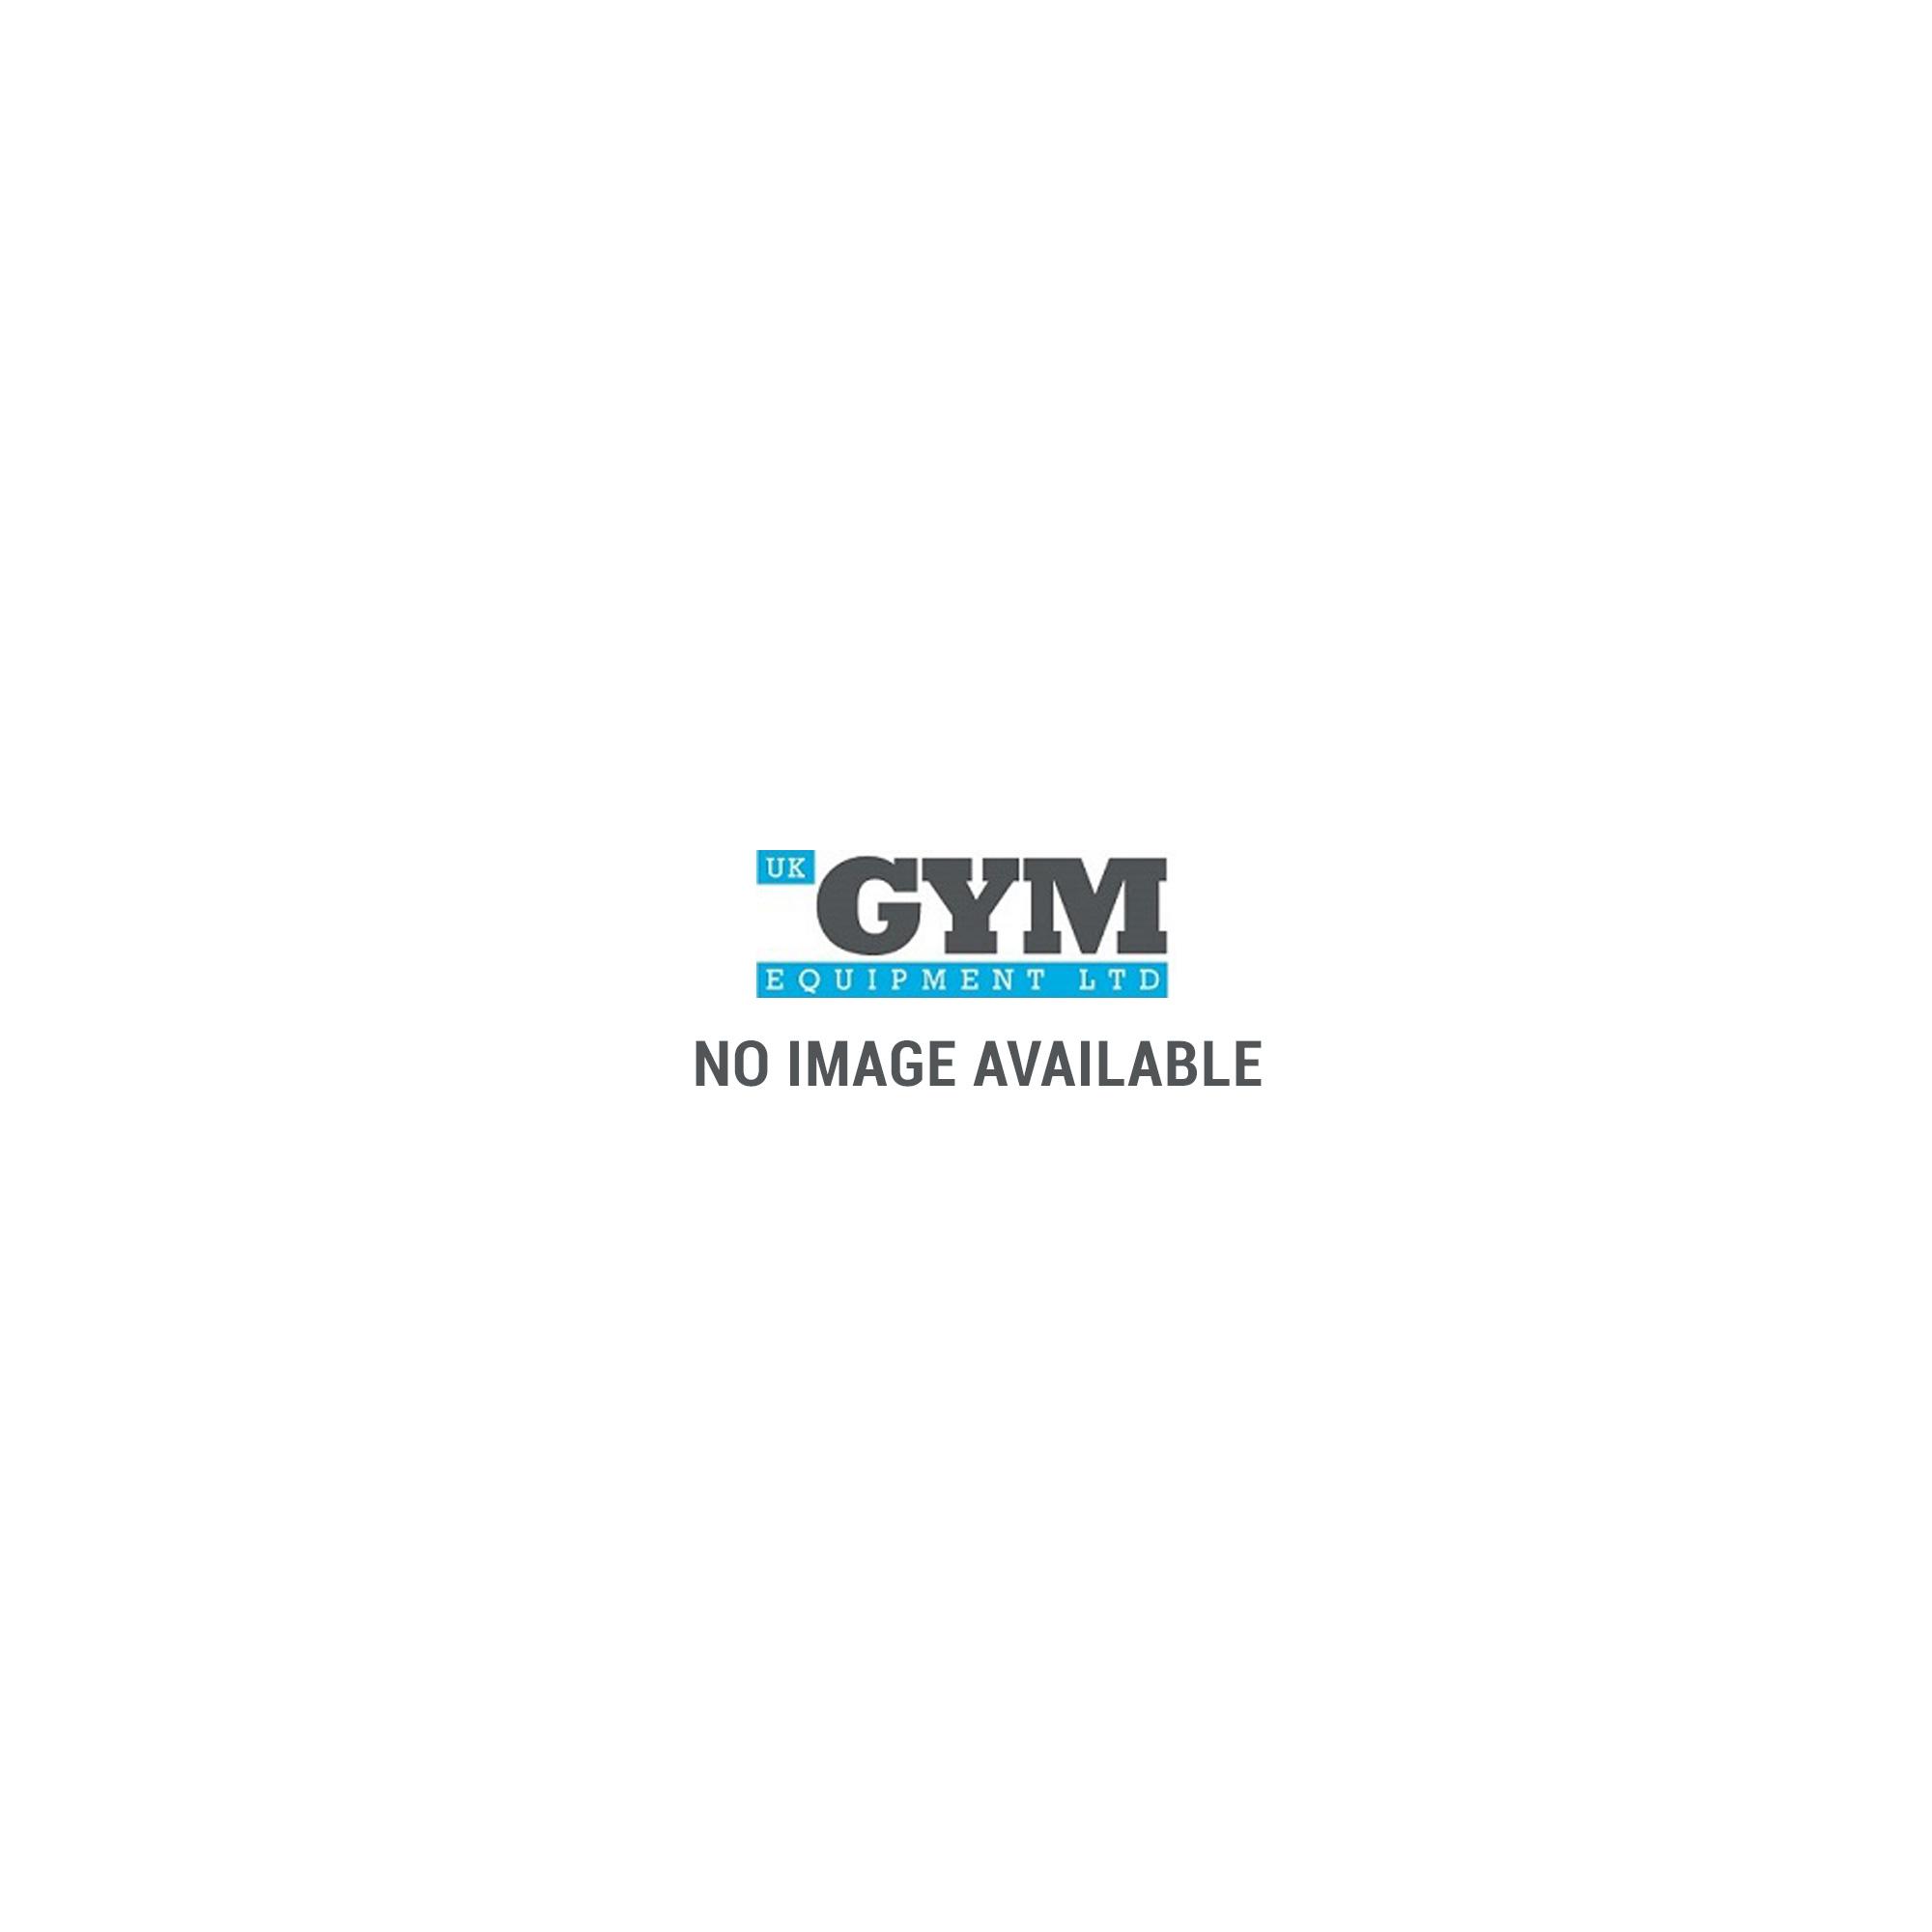 Star Trac Treadmill Parts Uk: Strength Training From UK Gym